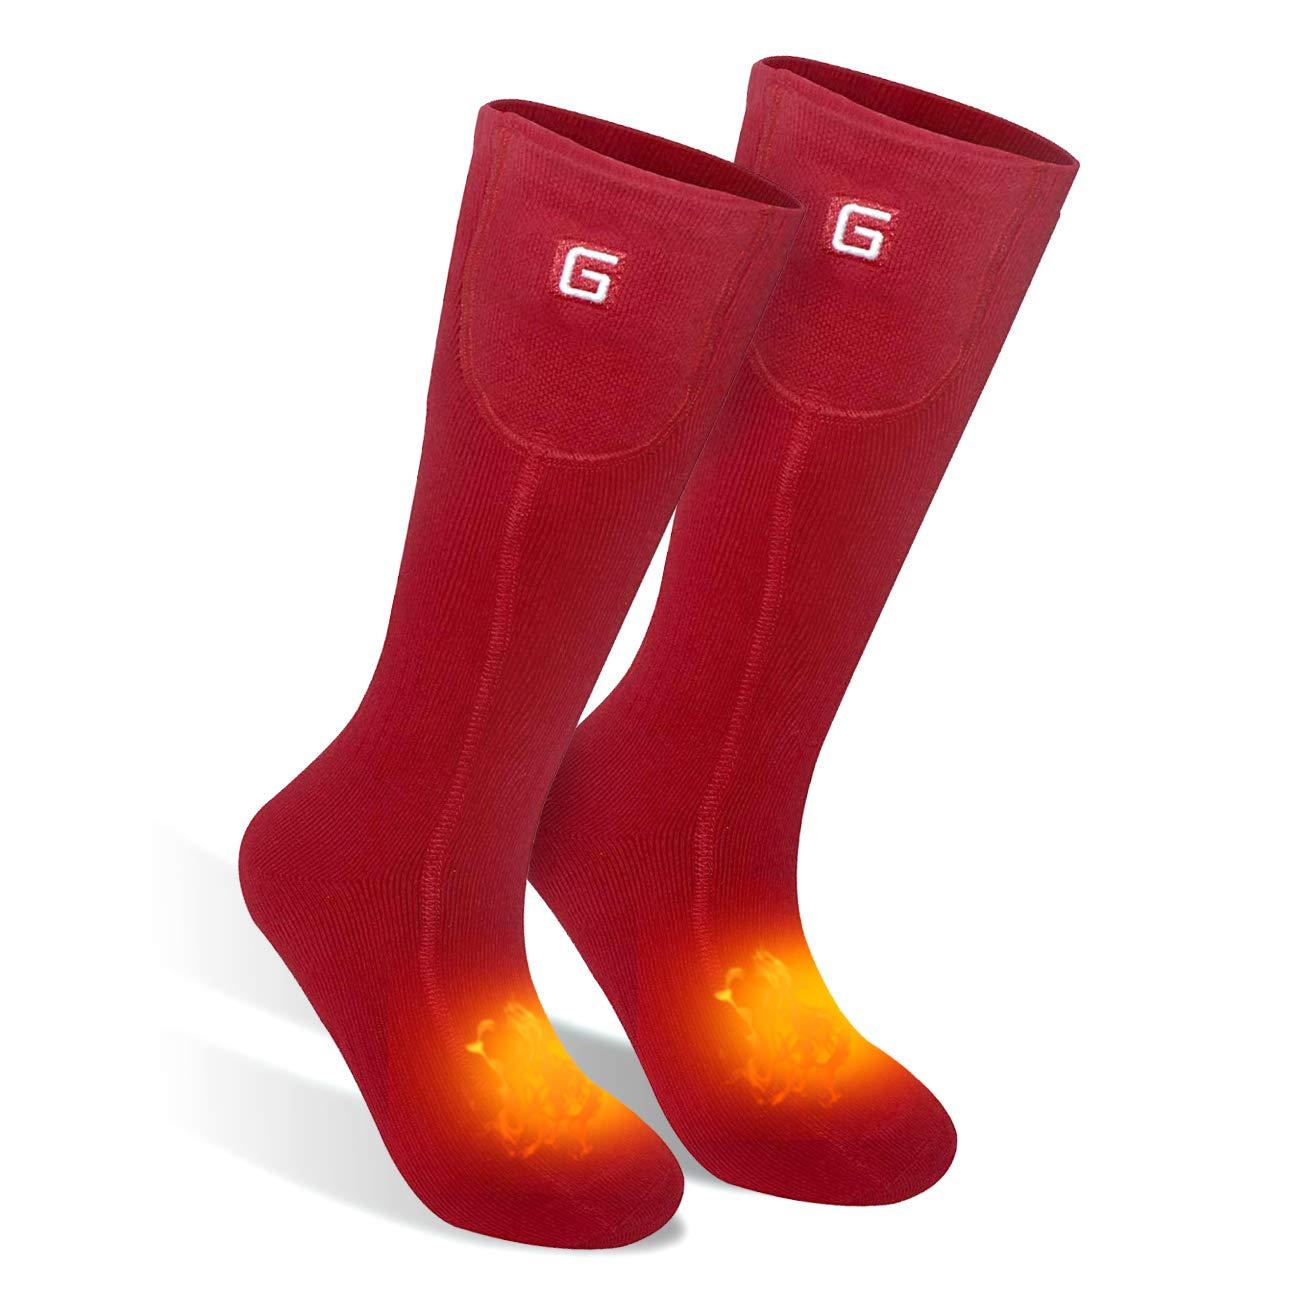 Men Women Socks Electric Socks Heated Socks for Chronically Cold Feet, Rechargeable Batteries Socks Hiking Socks Skiing Socks Socks (Red) by Highting